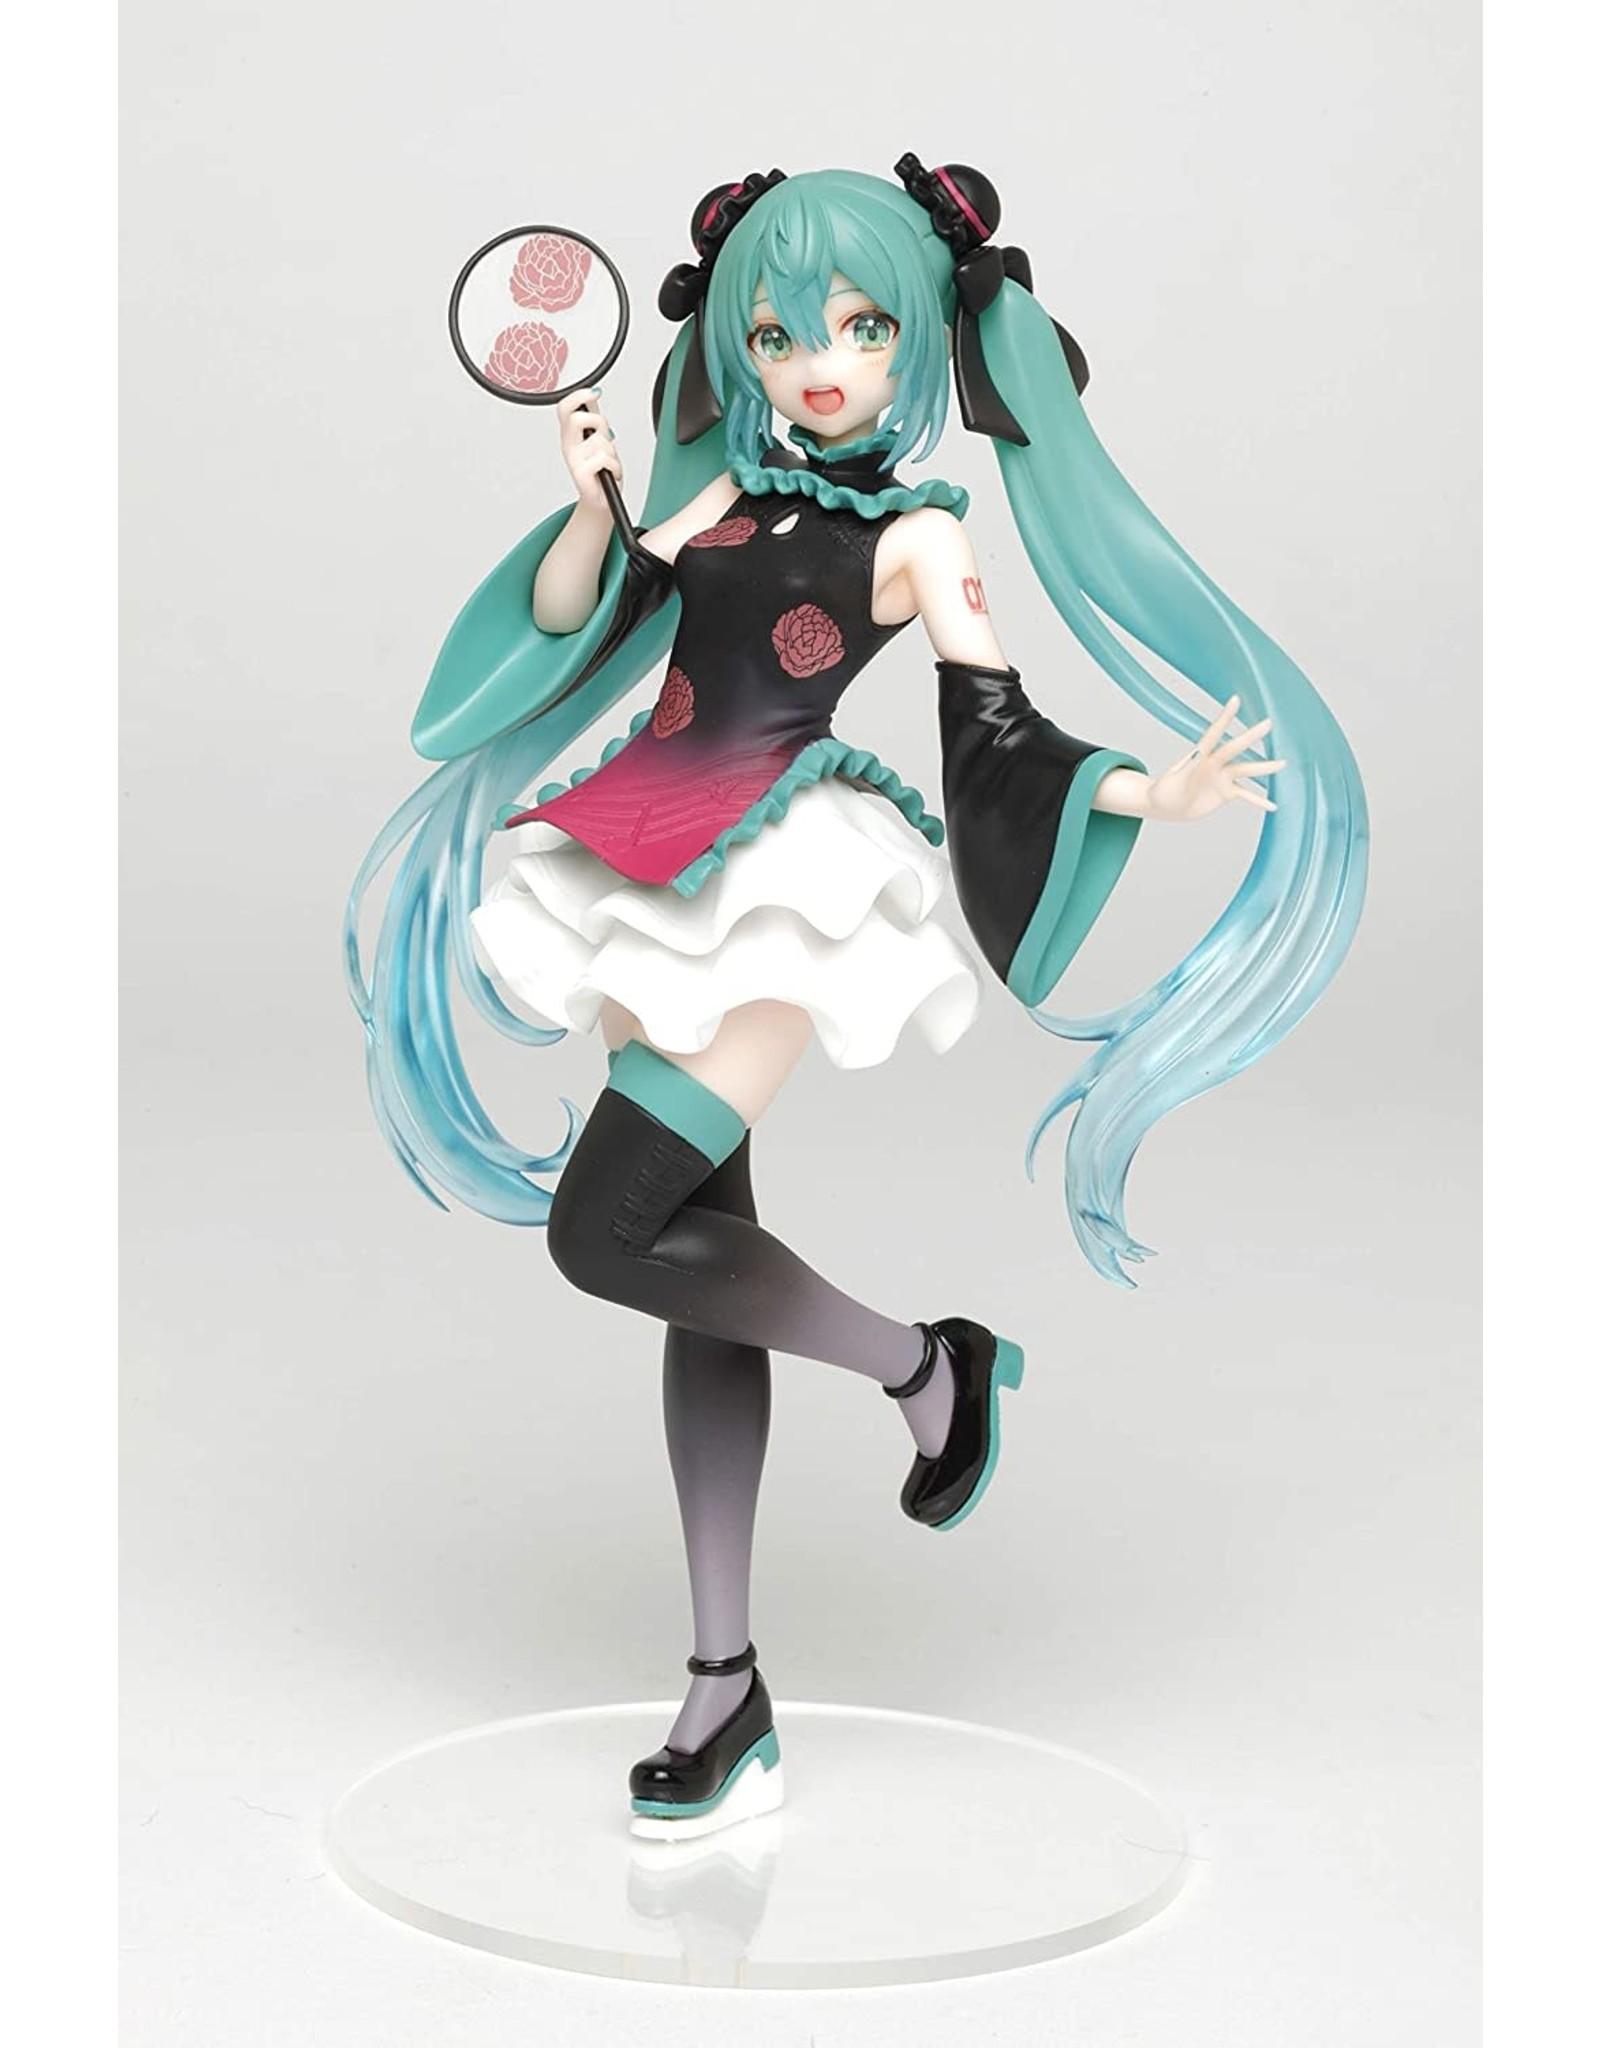 Hatsune Miku - China Dress Version - PVC Figure - 18 cm